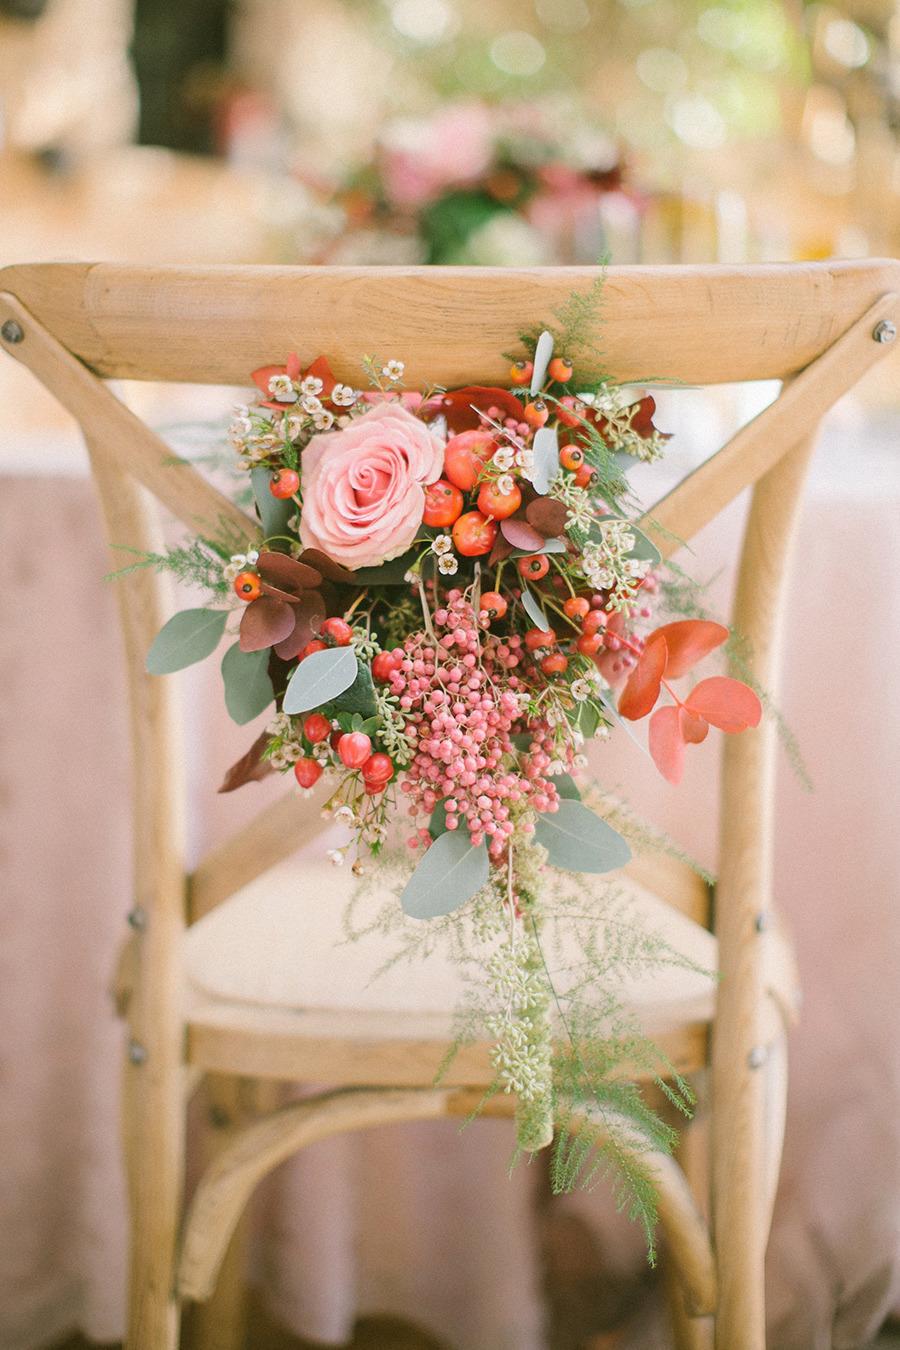 wedding chair decor - Boho Chic Wedding Inspiration Shoot from Anna Roussos Photography - annaroussos.com | Read more : http://www.fabmood.com/boho-chic-wedding-inspiration-shoot-anna-roussos-photography